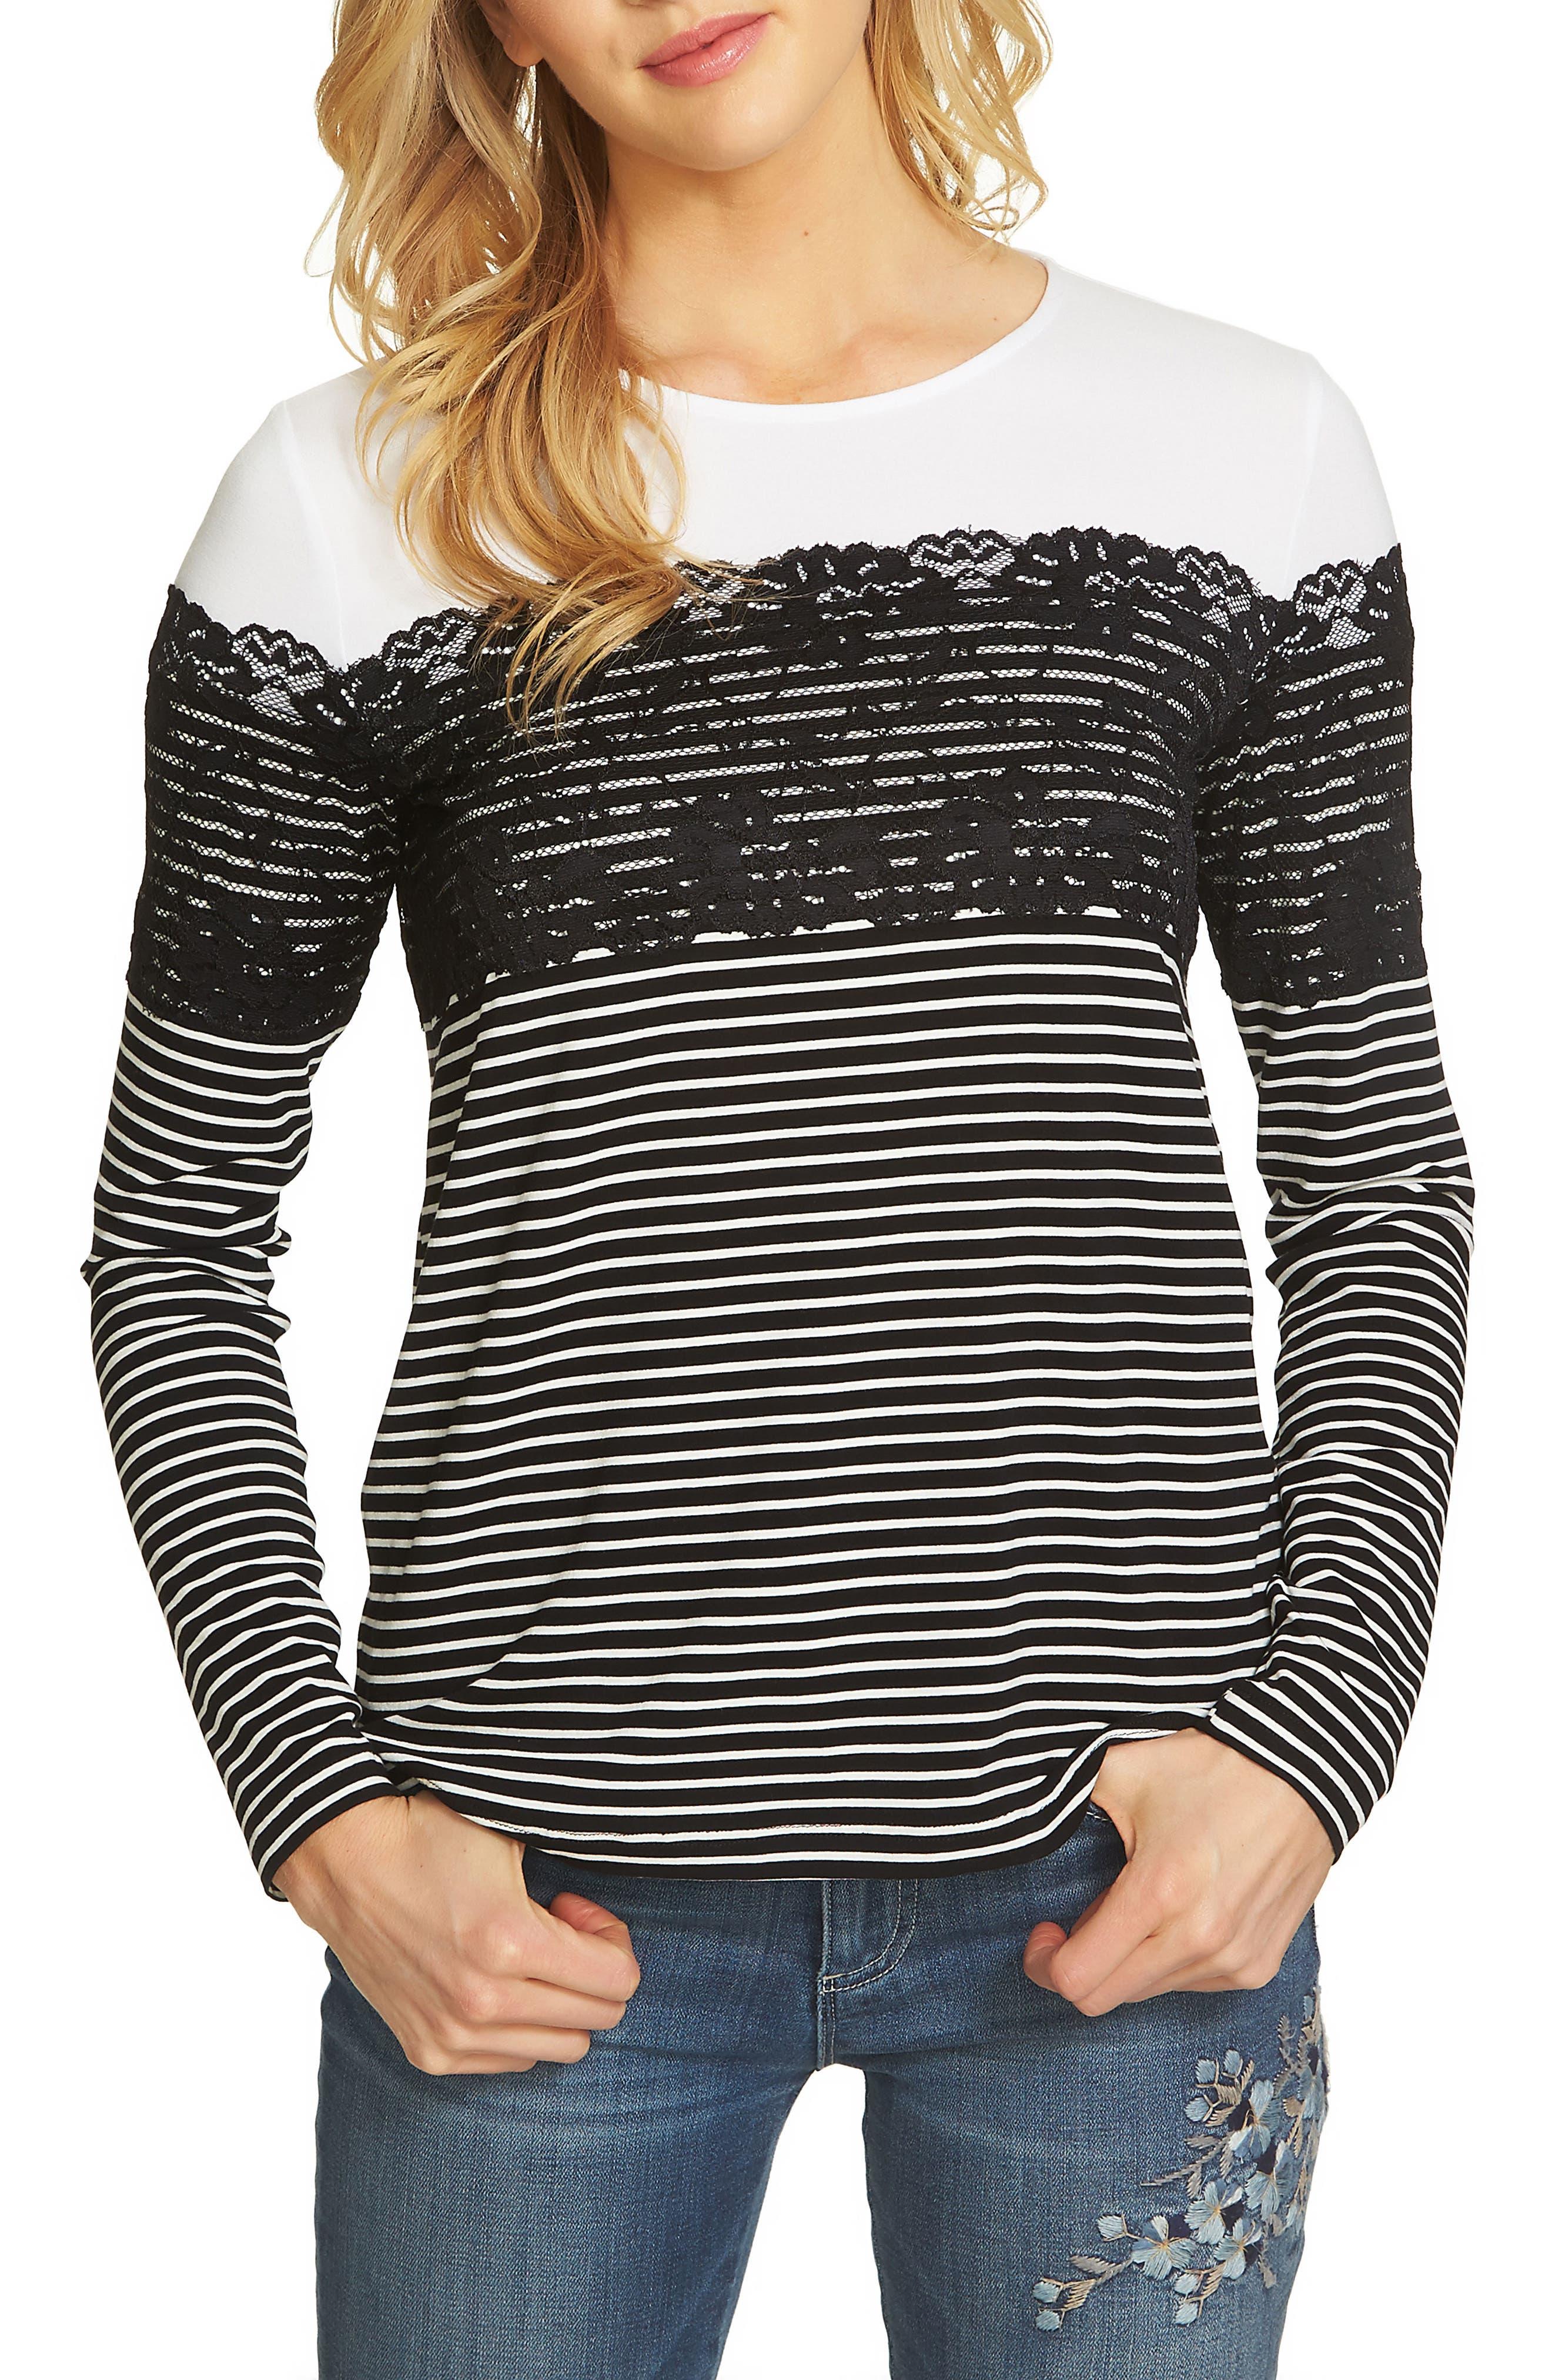 Main Image - CeCe Lacy Striped Top